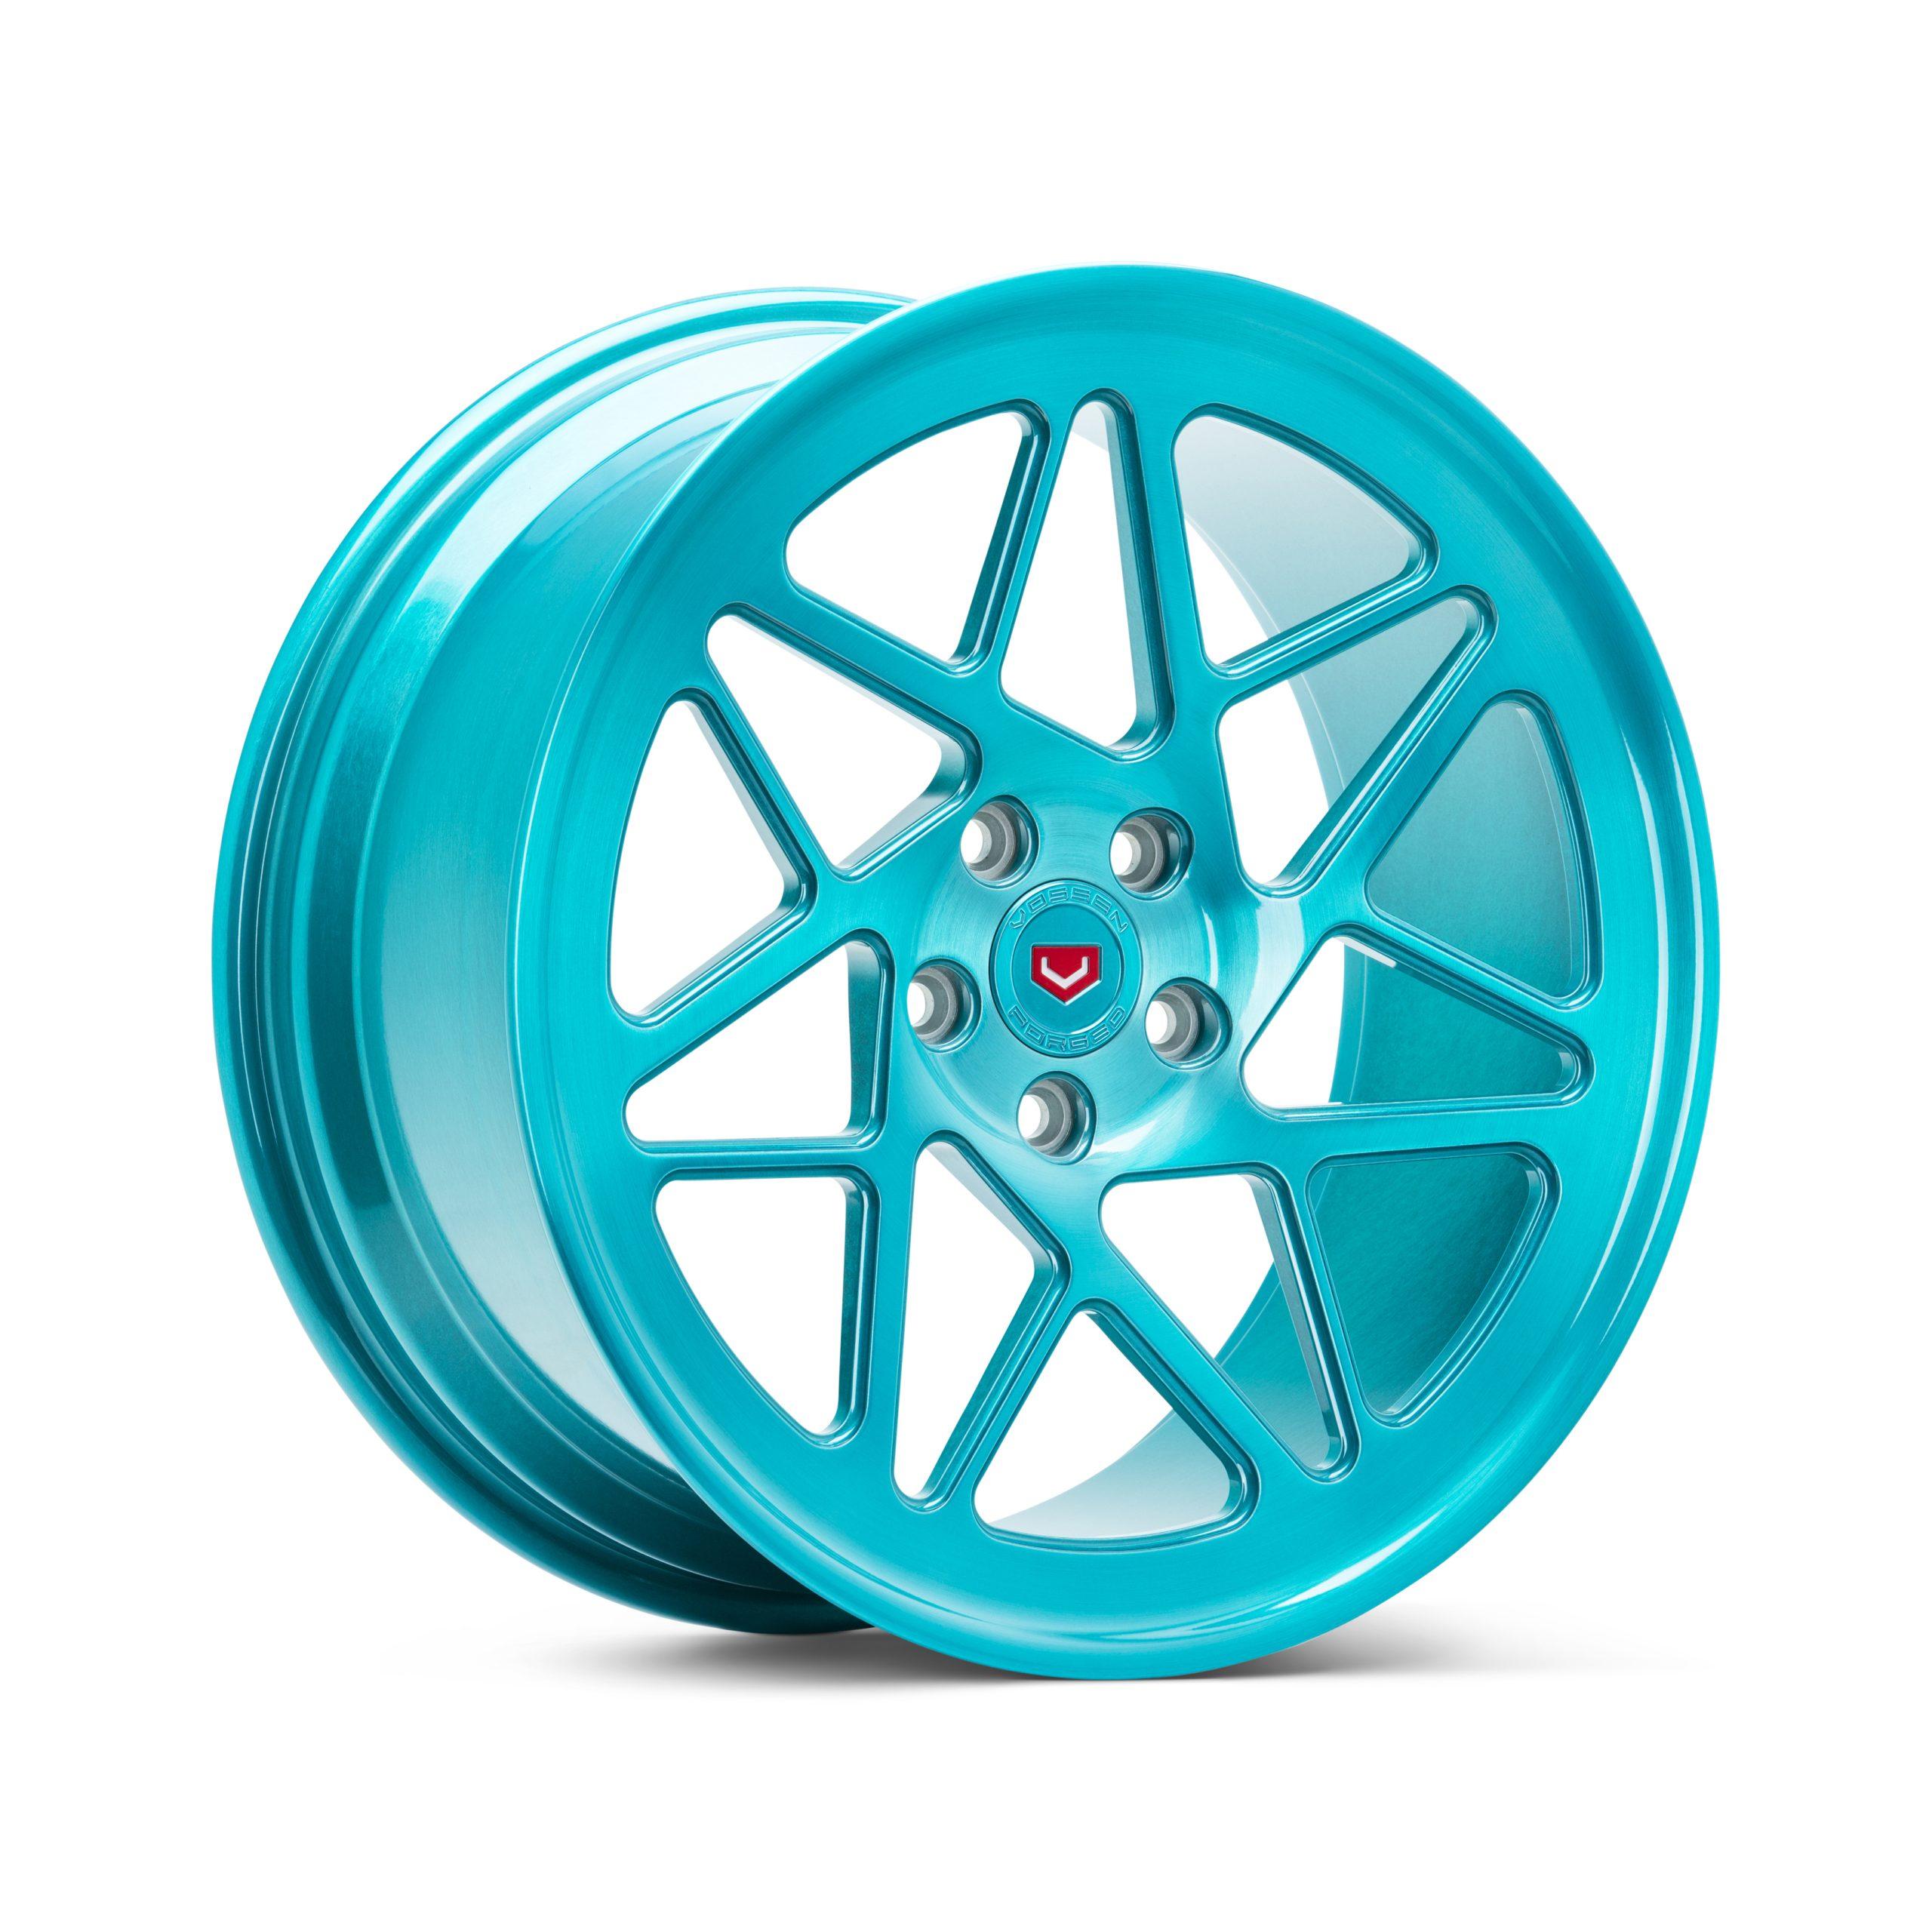 vossen-forged-lc-109t-wheel---c21-deco-teal---lc-series----vossen-wheels-2018--1011-2_27475974667_o